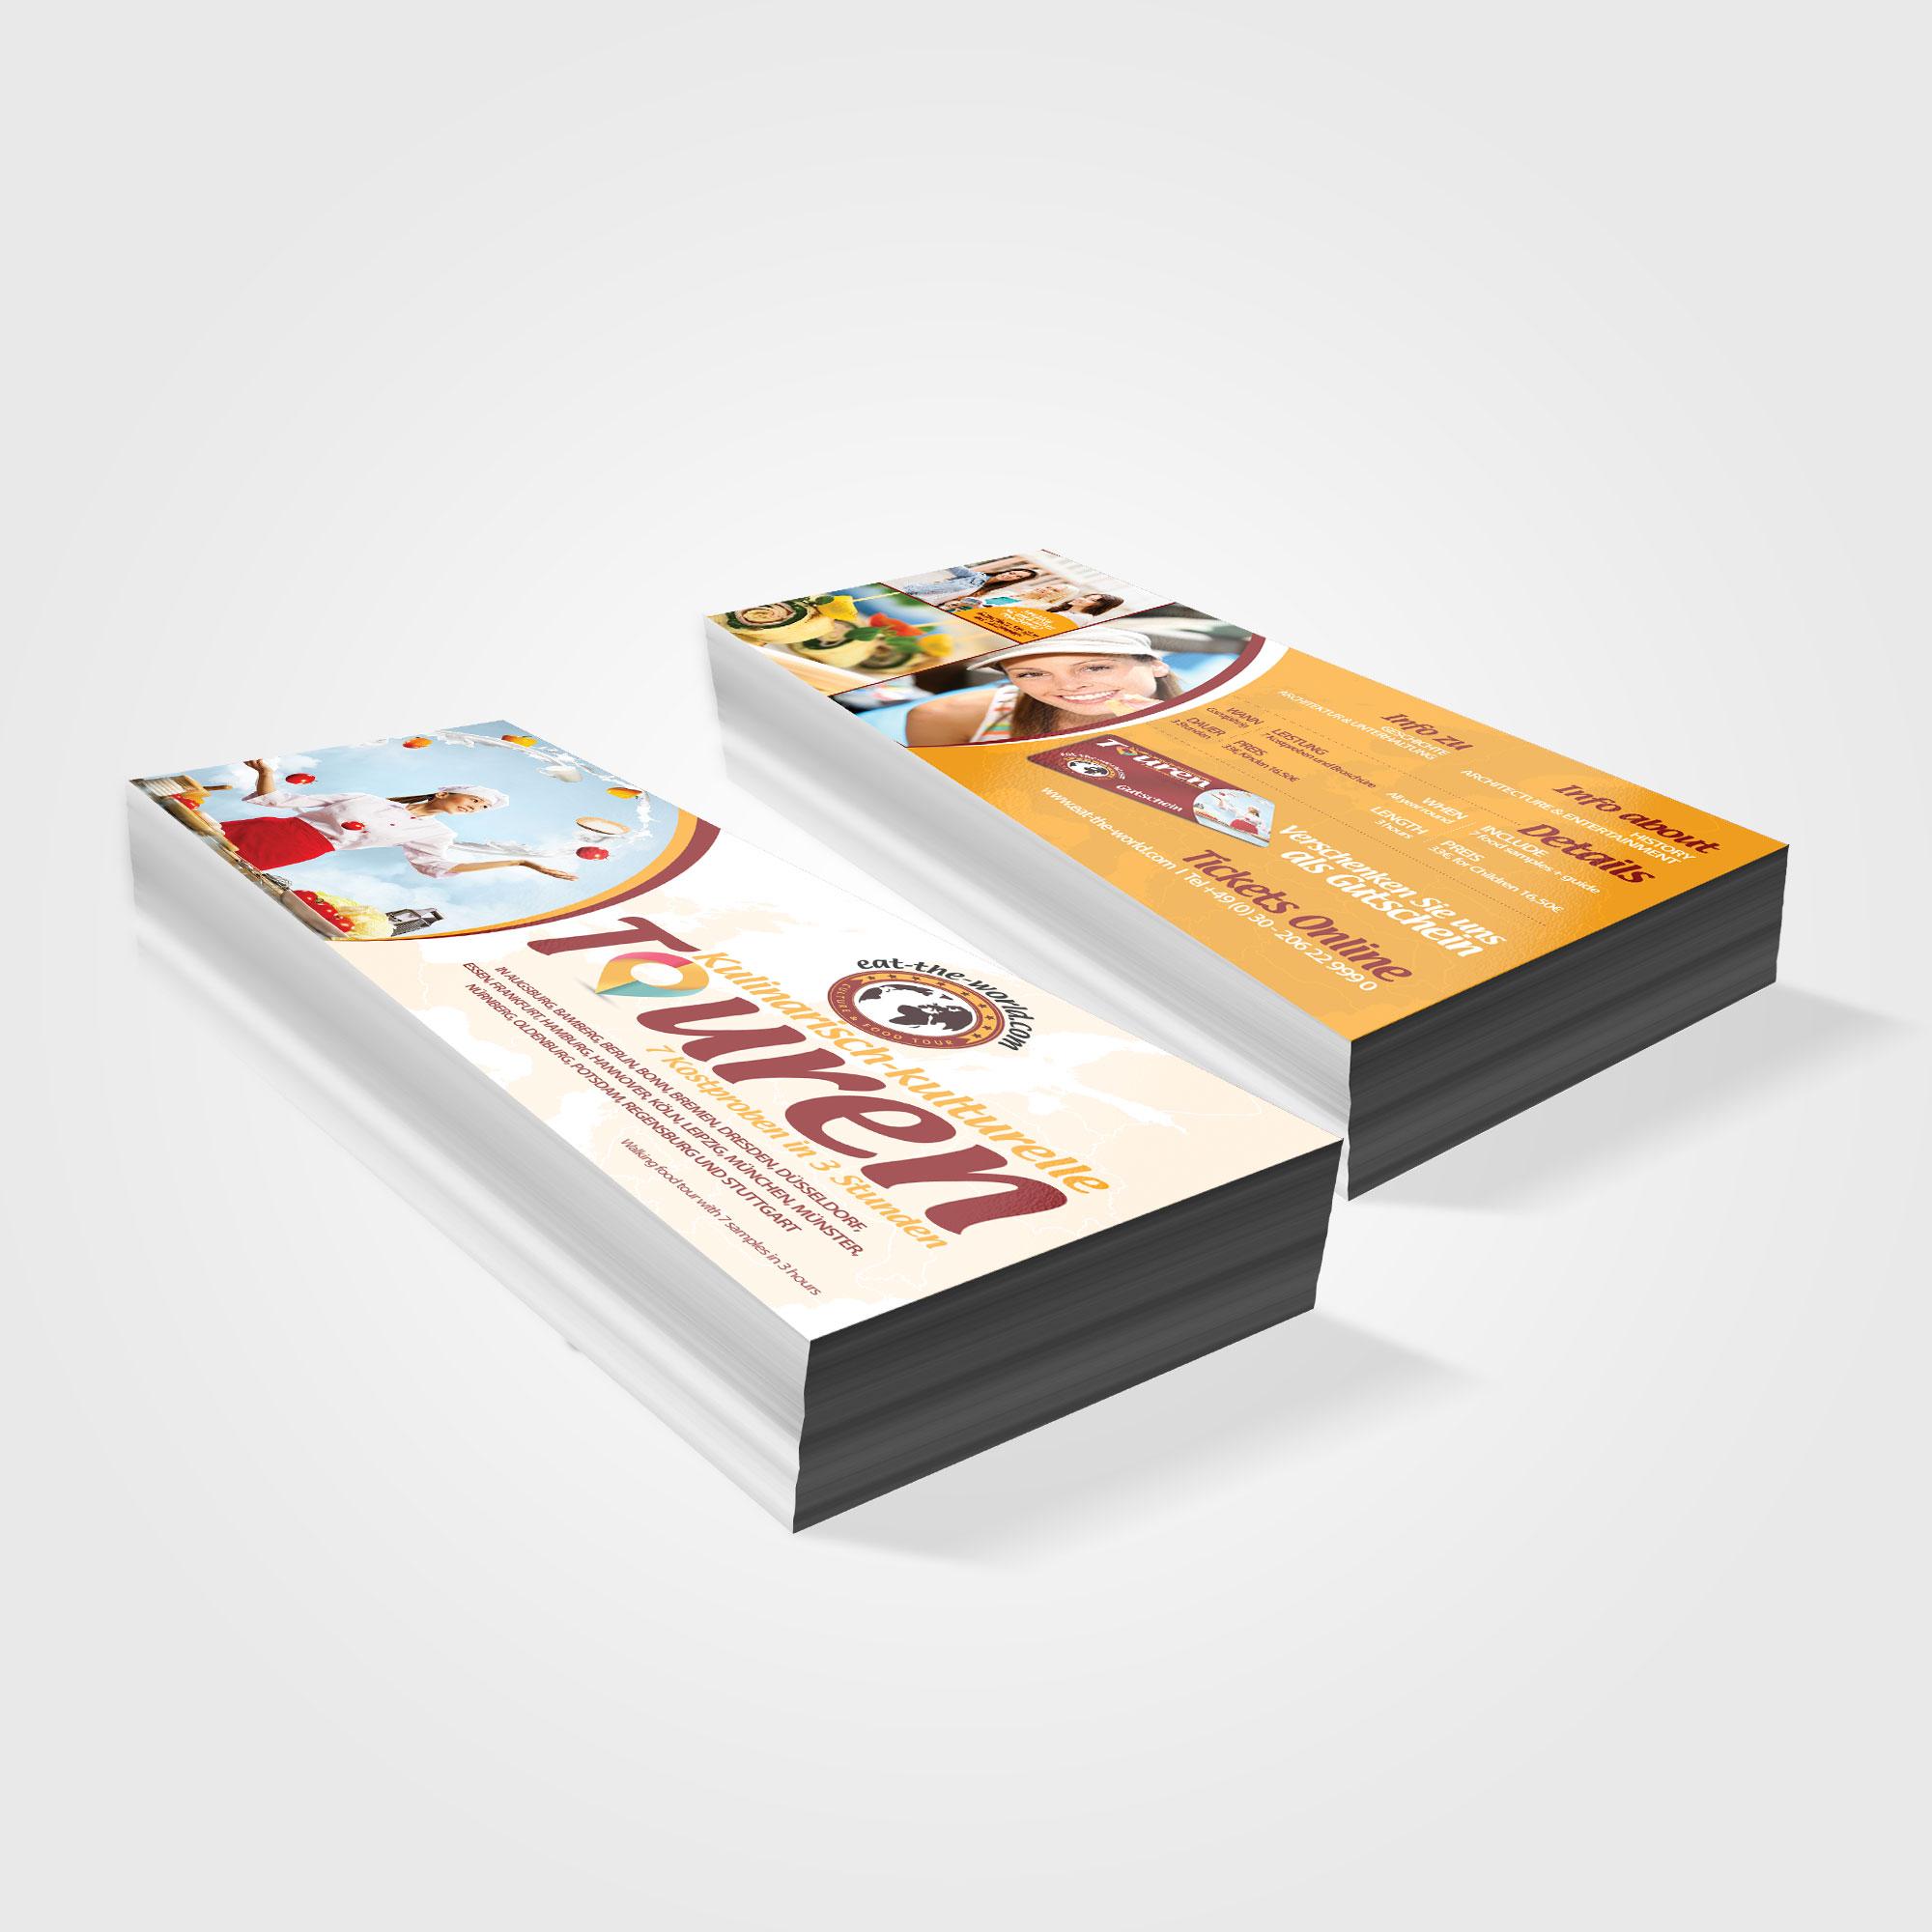 Flyer designen DIN lang (9,8 x 21 cm): food/ event